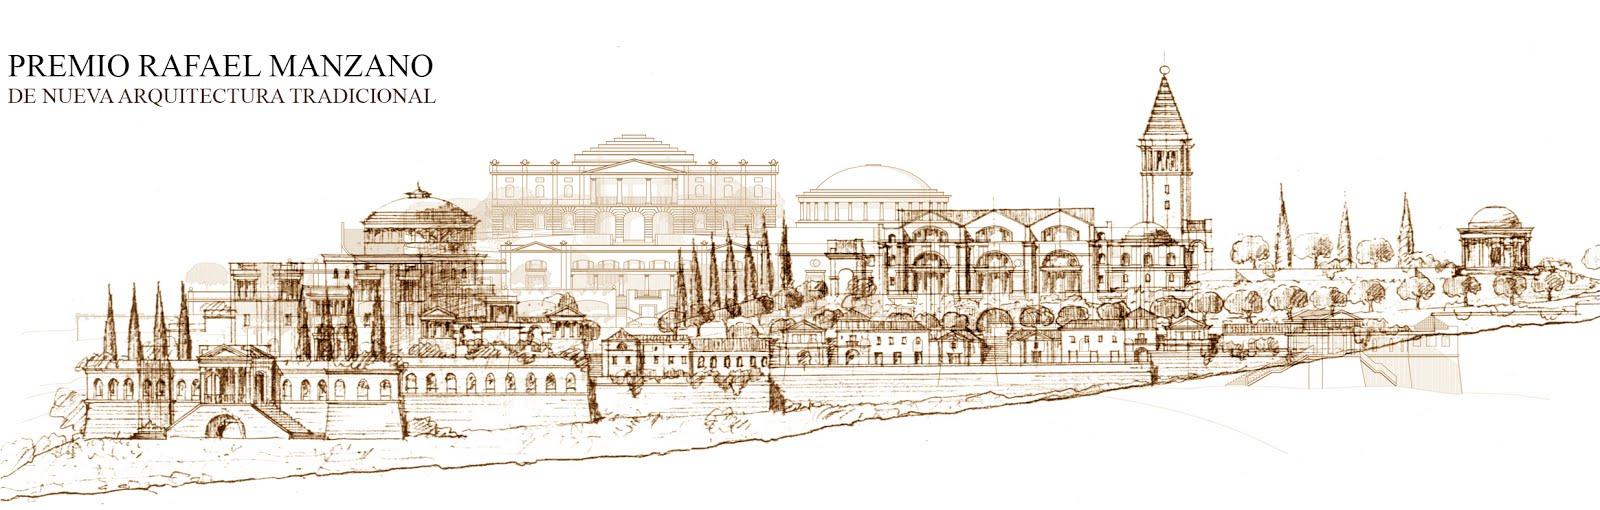 Premio Rafael Manzano de Nueva Arquitectura Tradicional